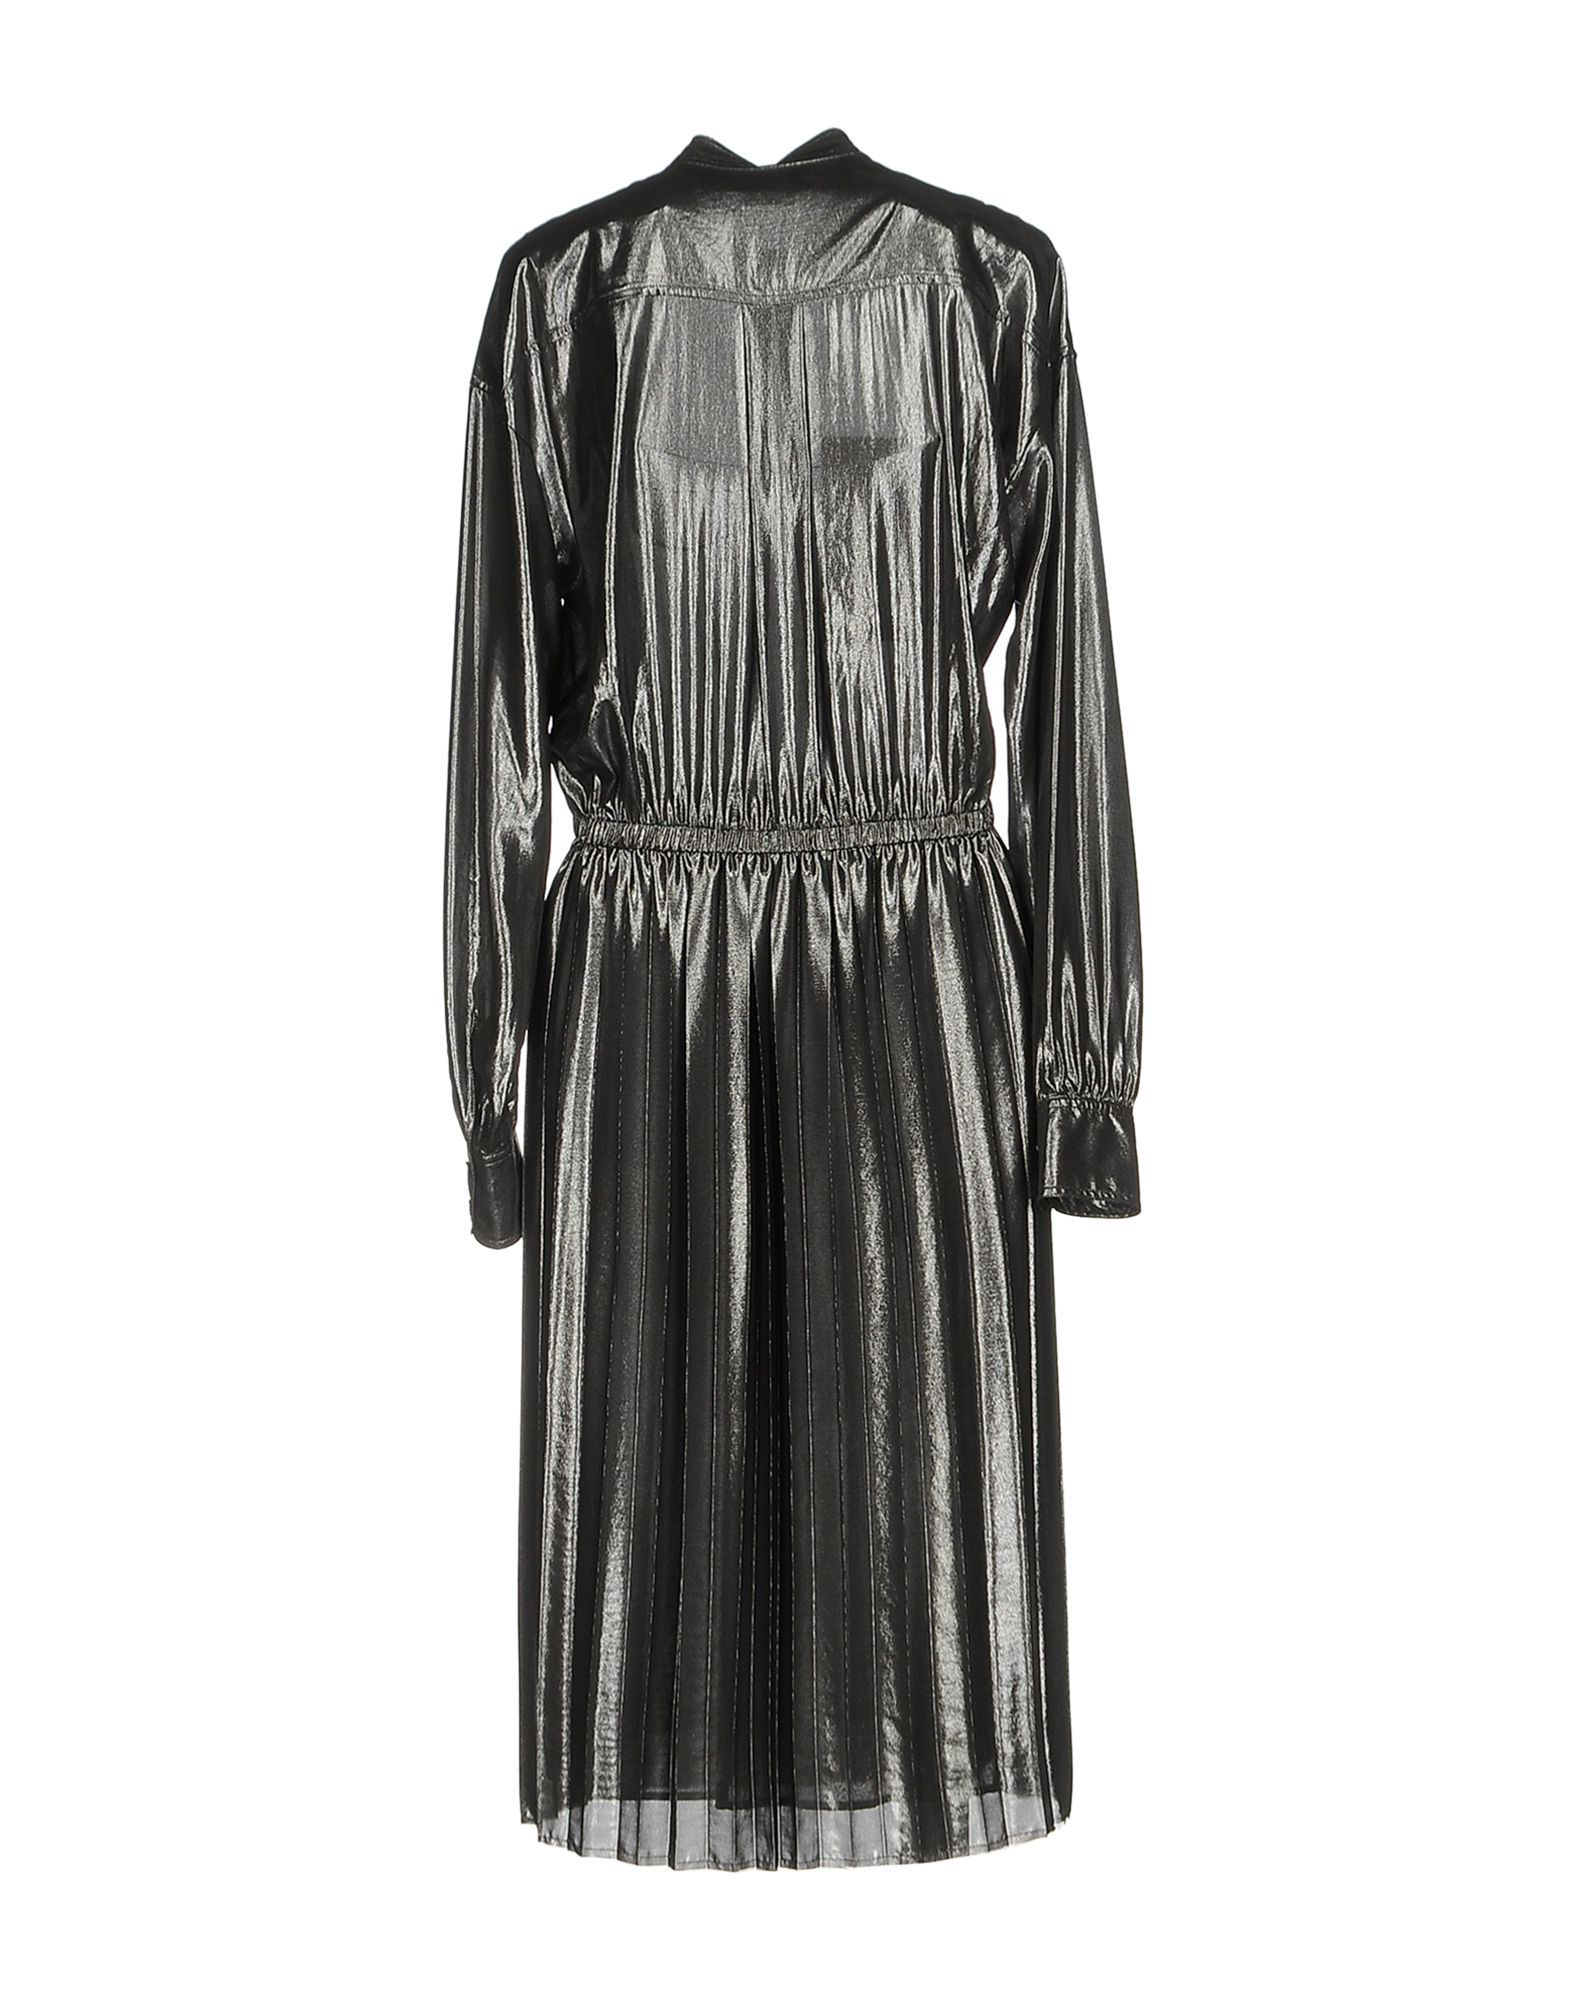 Isabel Marant Etoile Lead Lame Dress